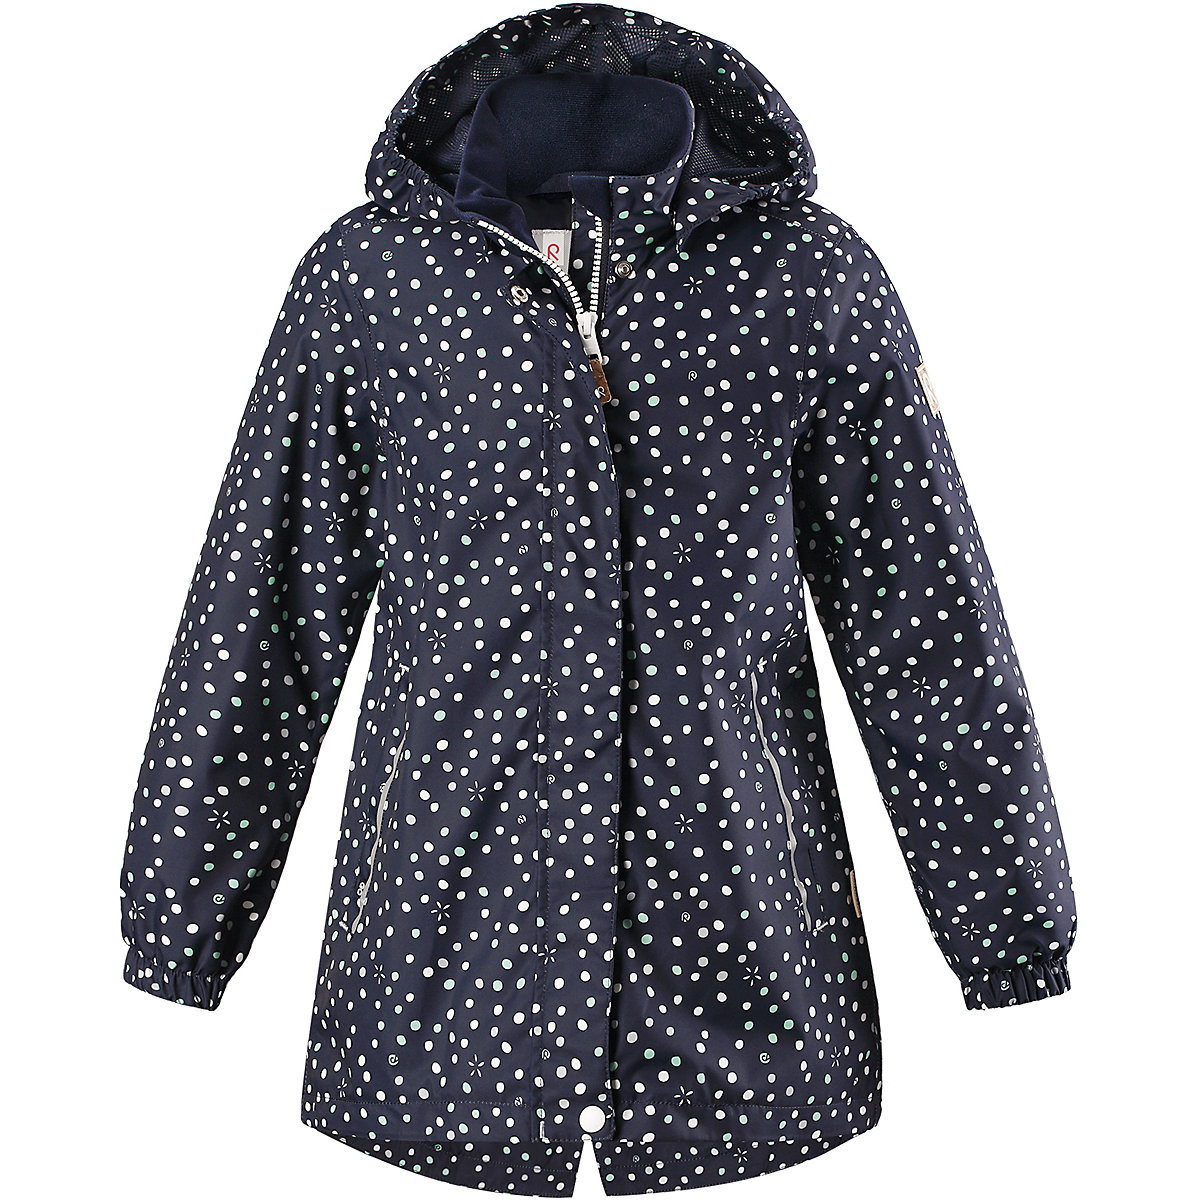 REIMA Jackets 7632638 for girls polyester winter  fur clothes girl балетки vitacci vitacci mp002xw18vrl